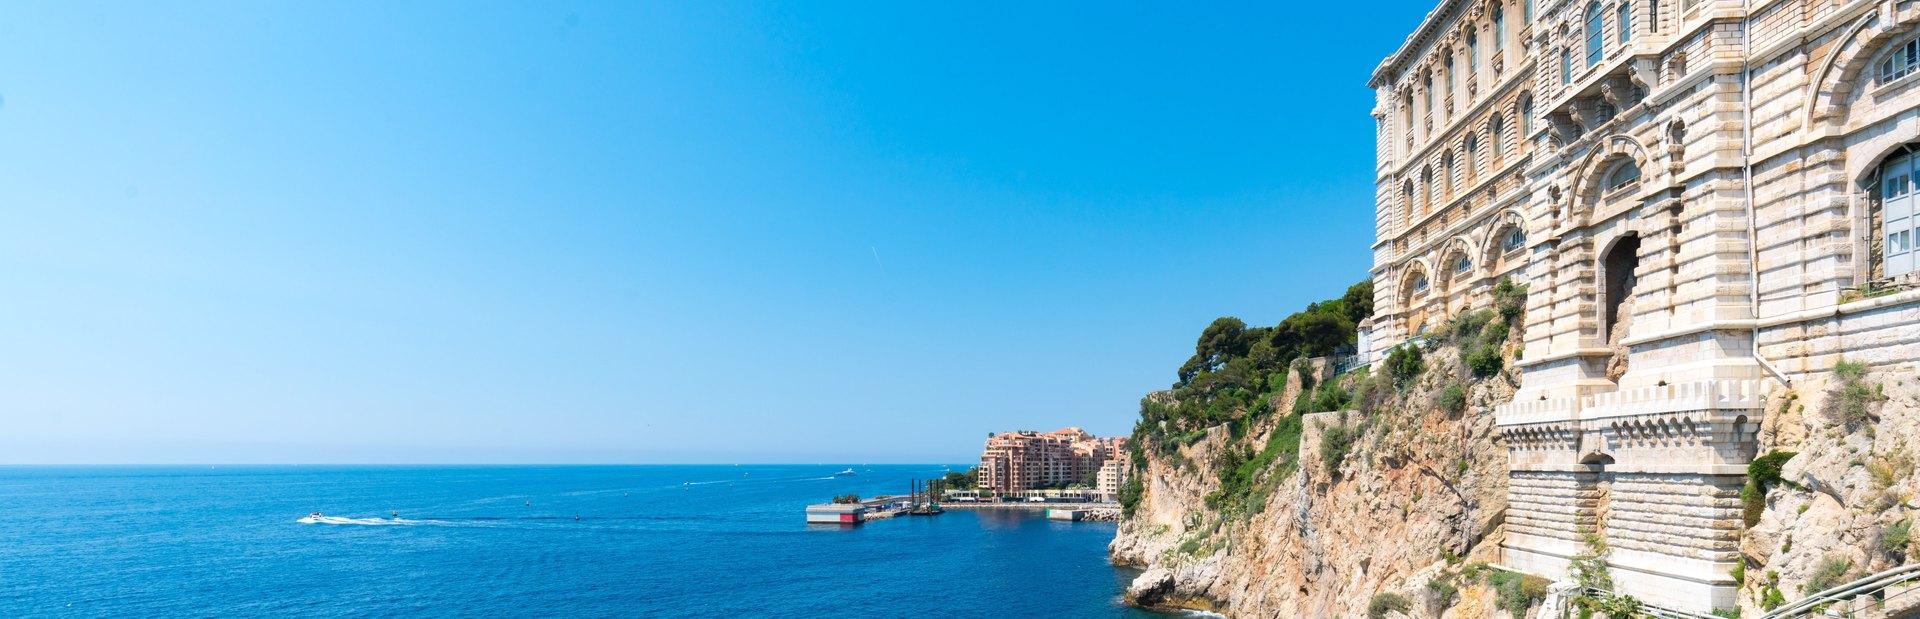 Monaco climate photo